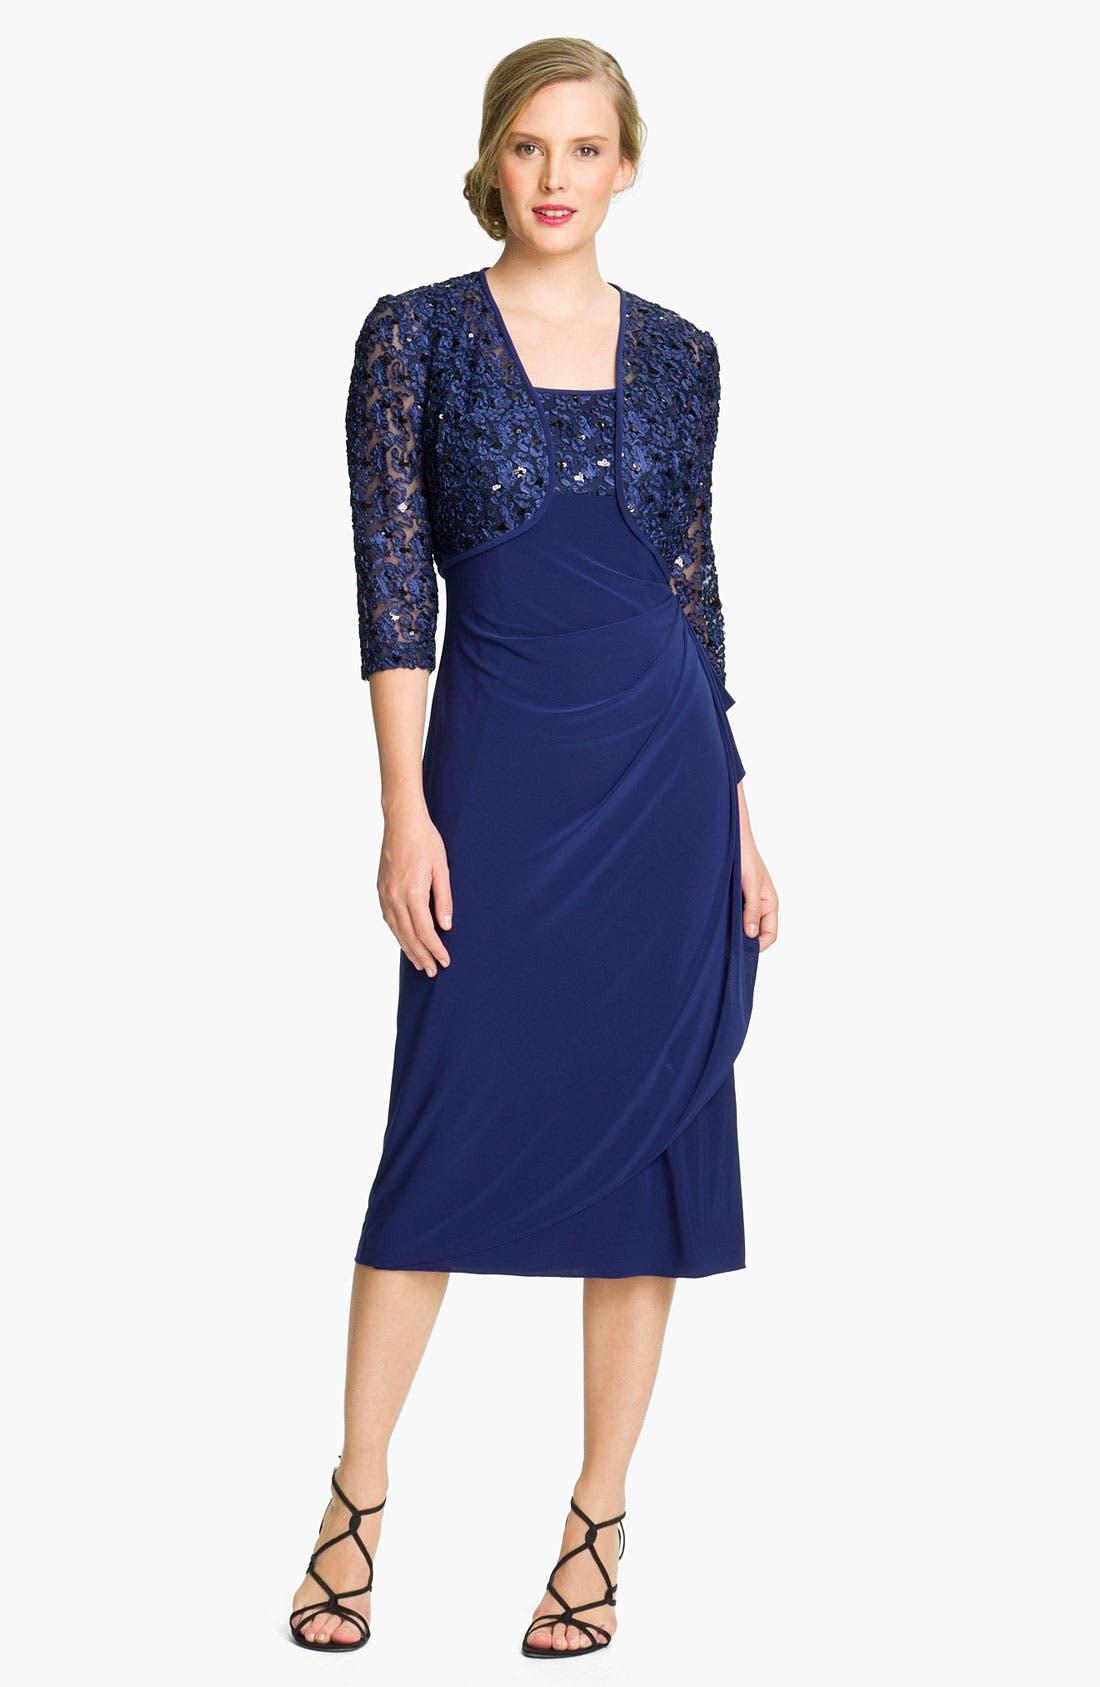 Main Image - Alex Evenings Jersey Dress & Embroidered Jacket (Petite)